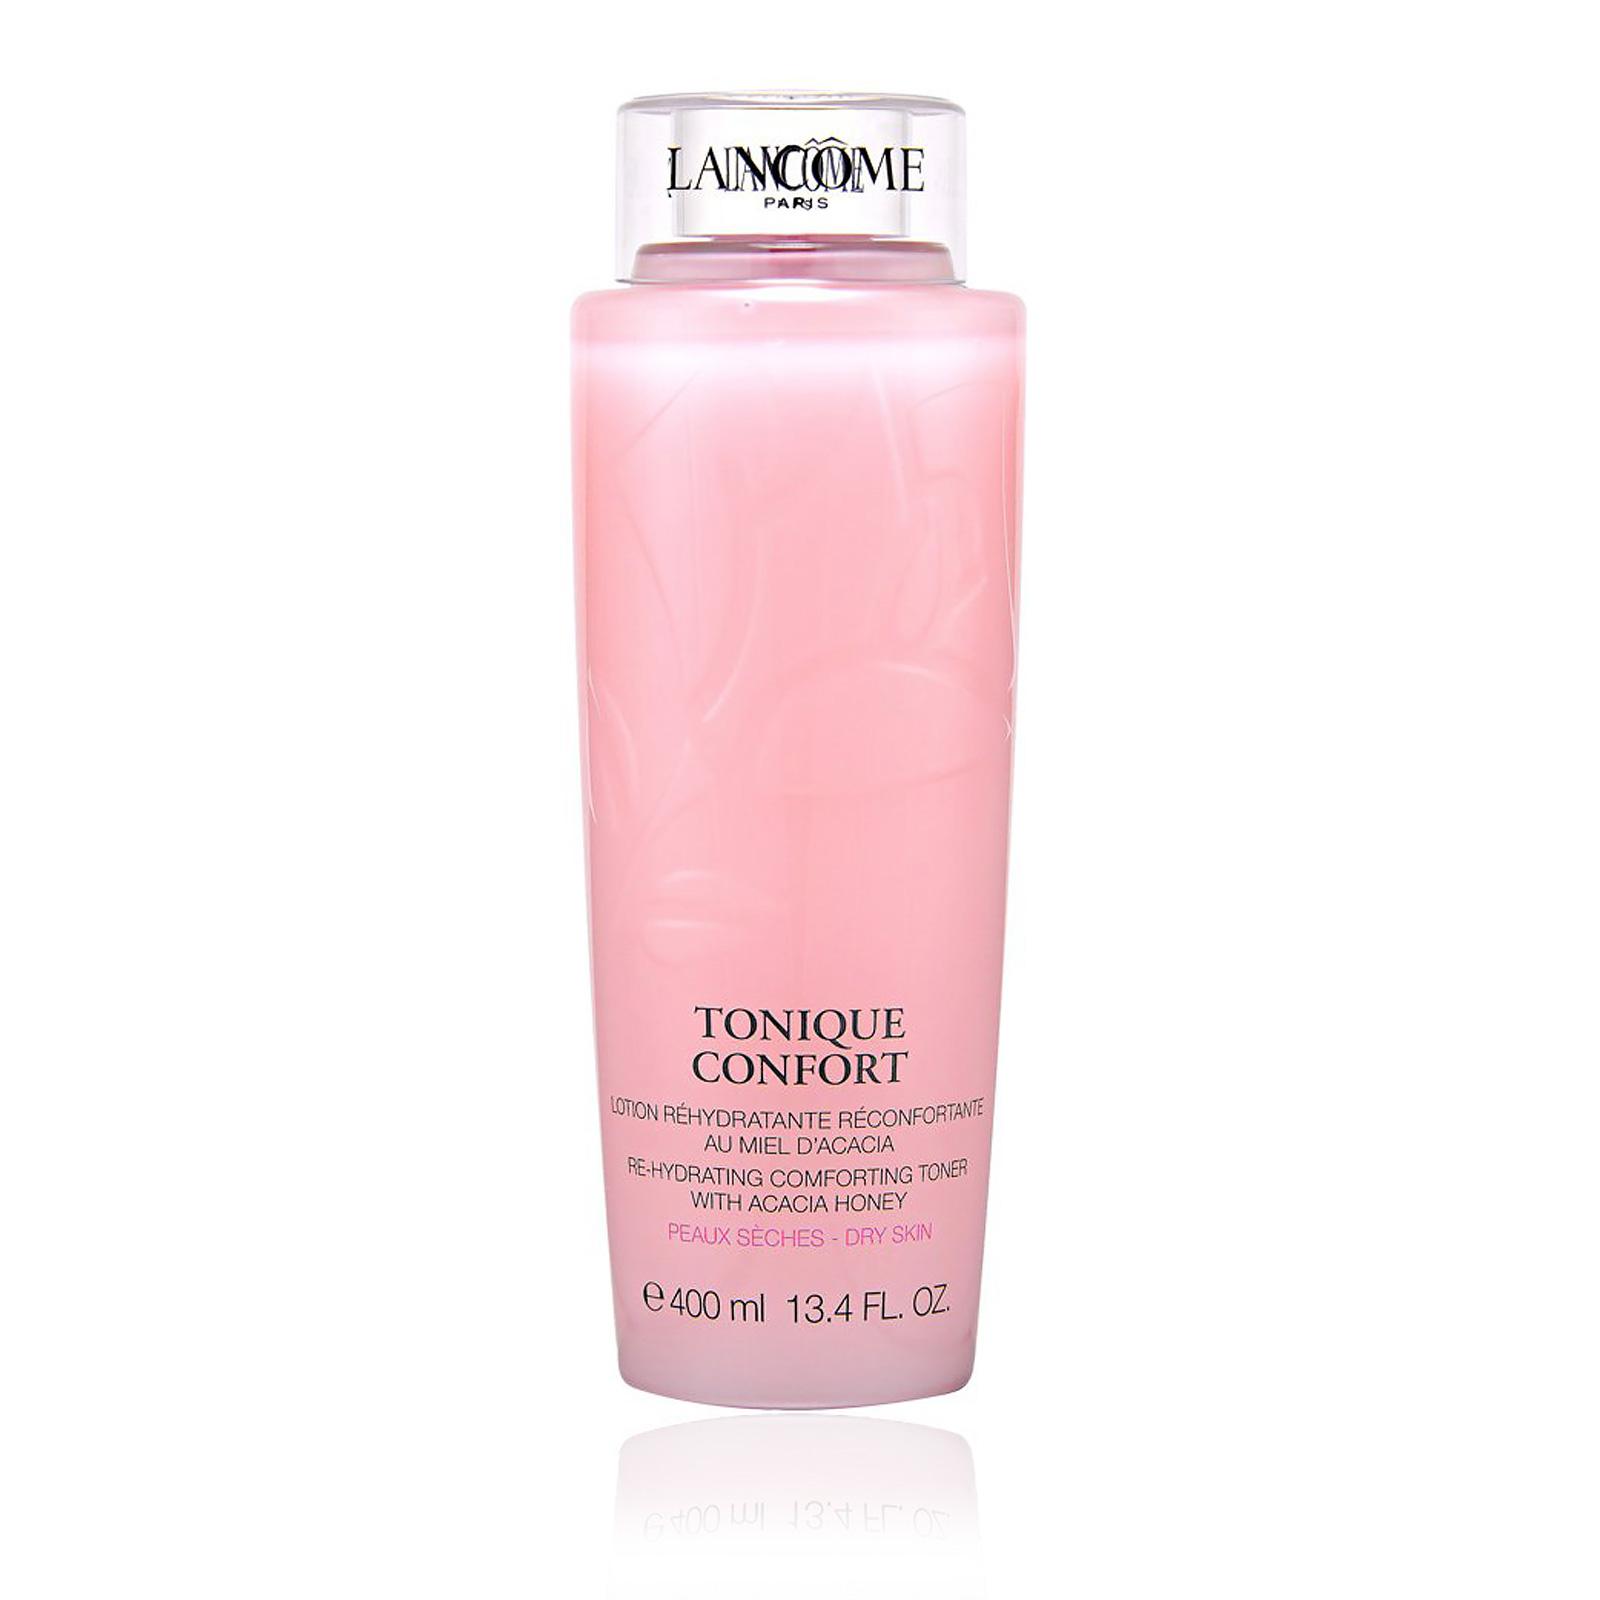 Re-Hydrating Comforting Toner (Dry Skin)